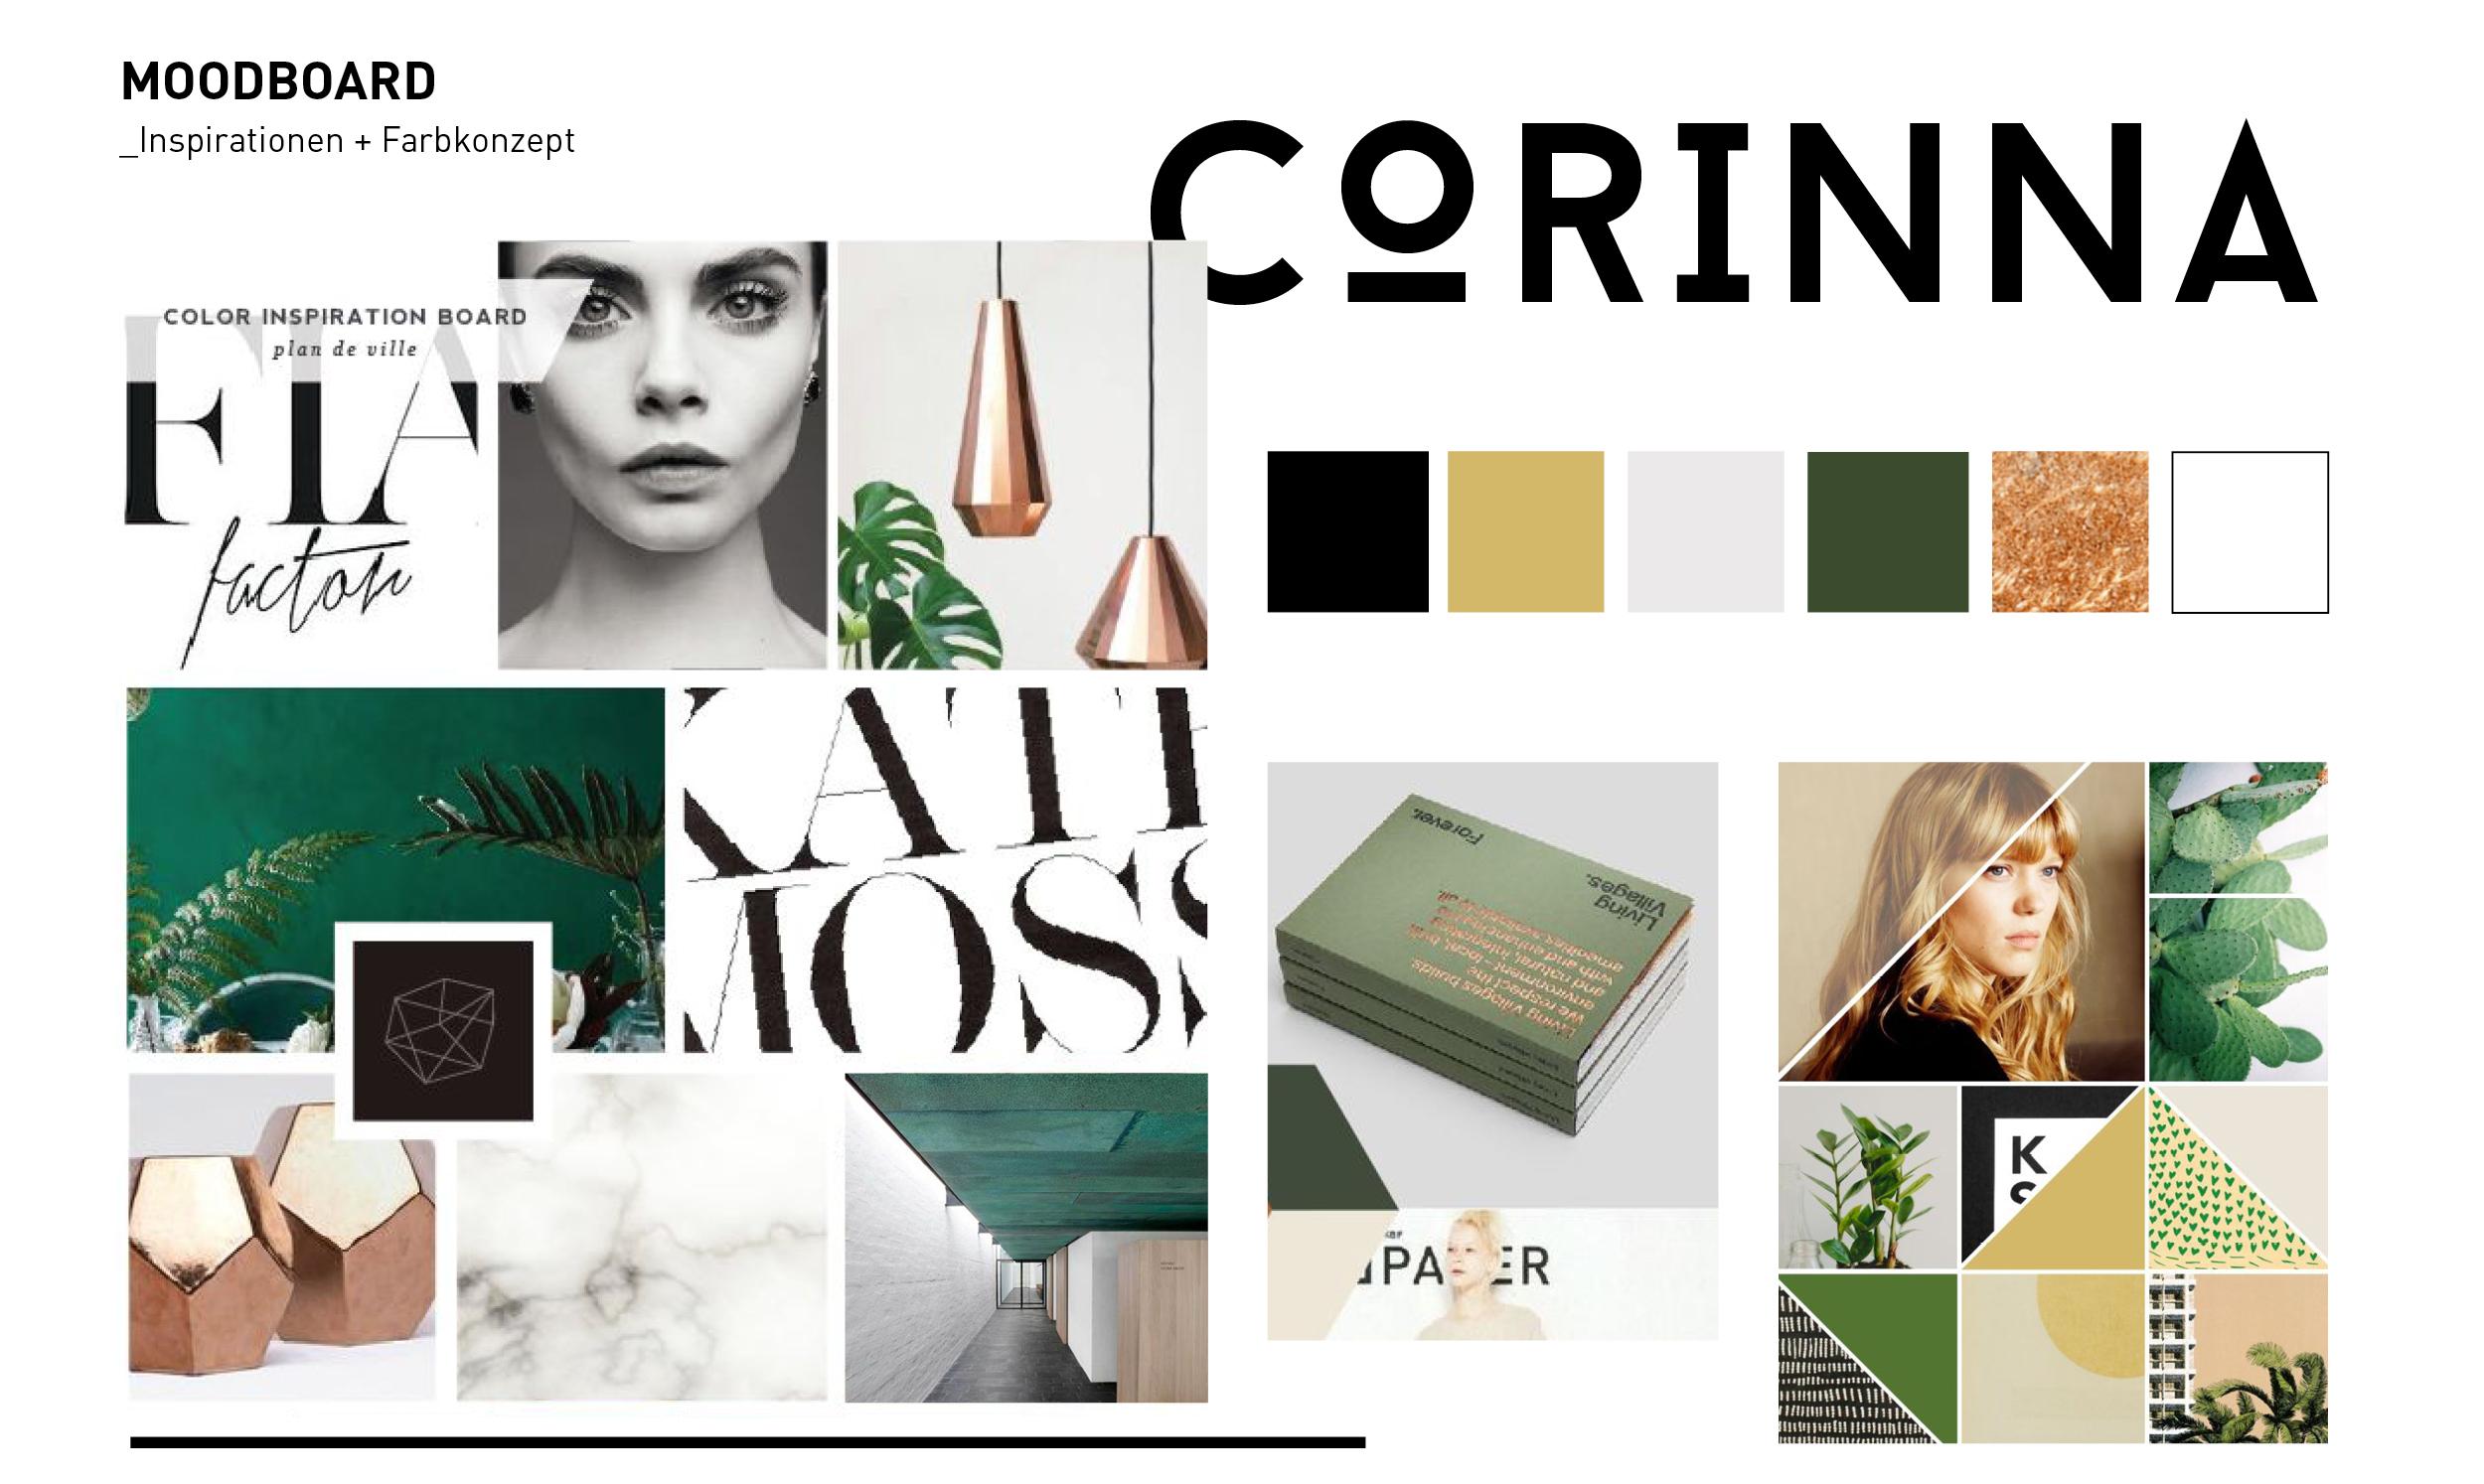 2_web_Corinna-Keiser_Moodboard